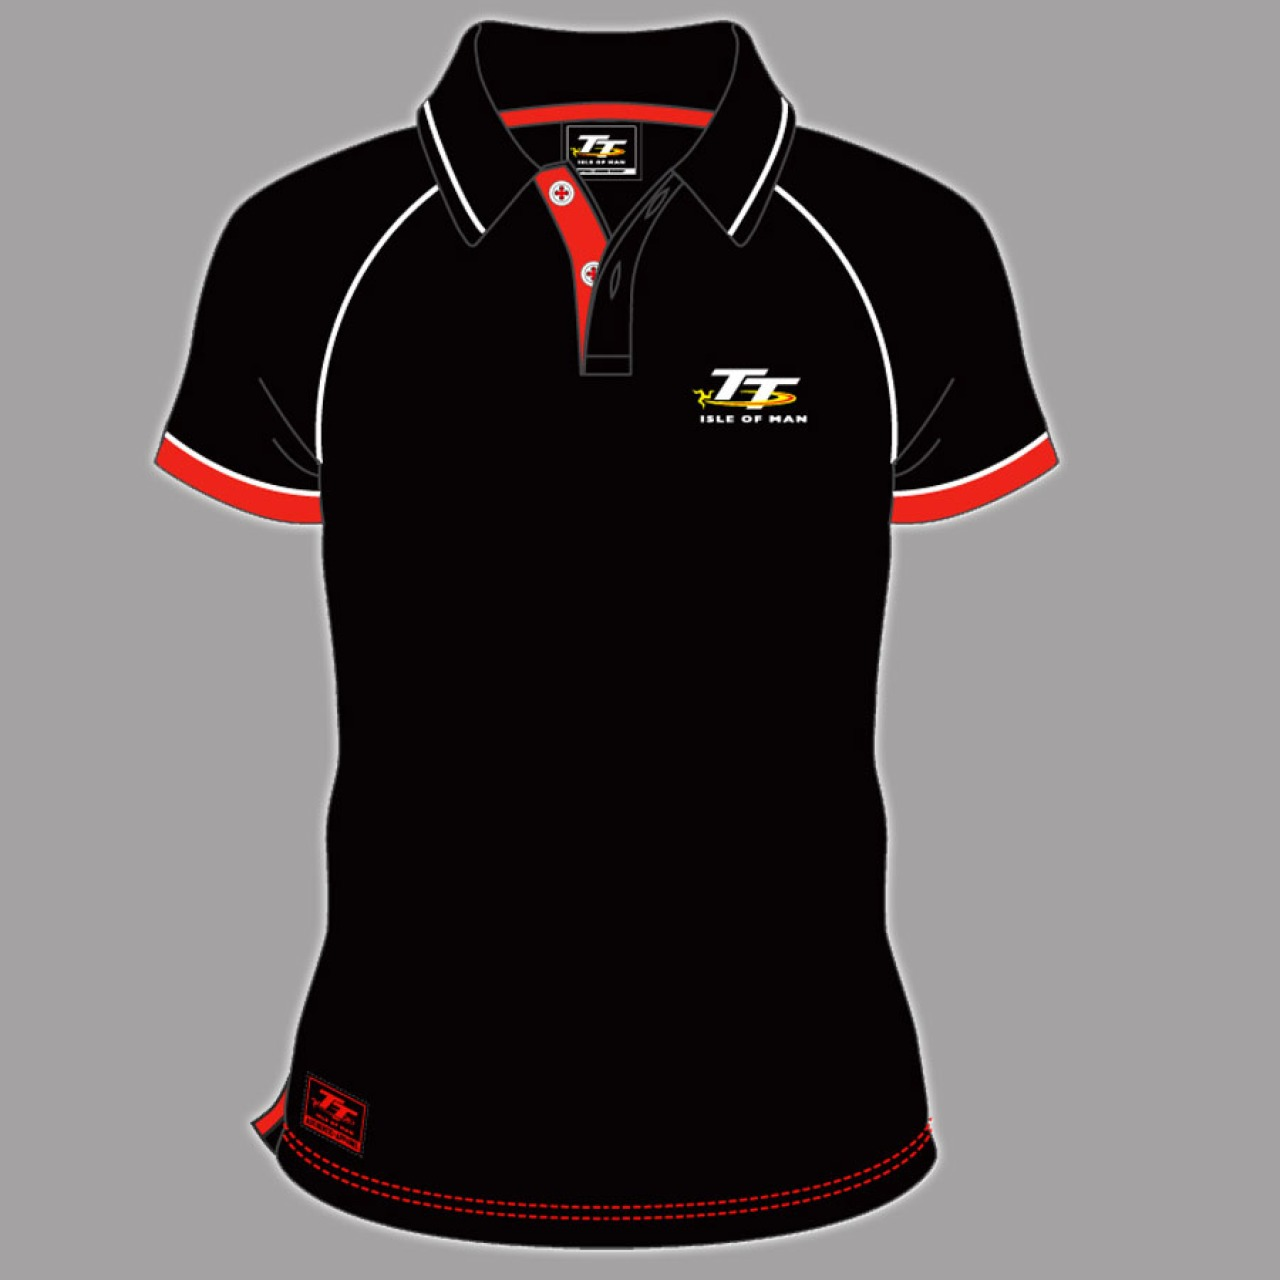 TT POLO SHIRT BLACK WITH RED TRIM 16AP2 | TT POLO SHIRTS | TT ...